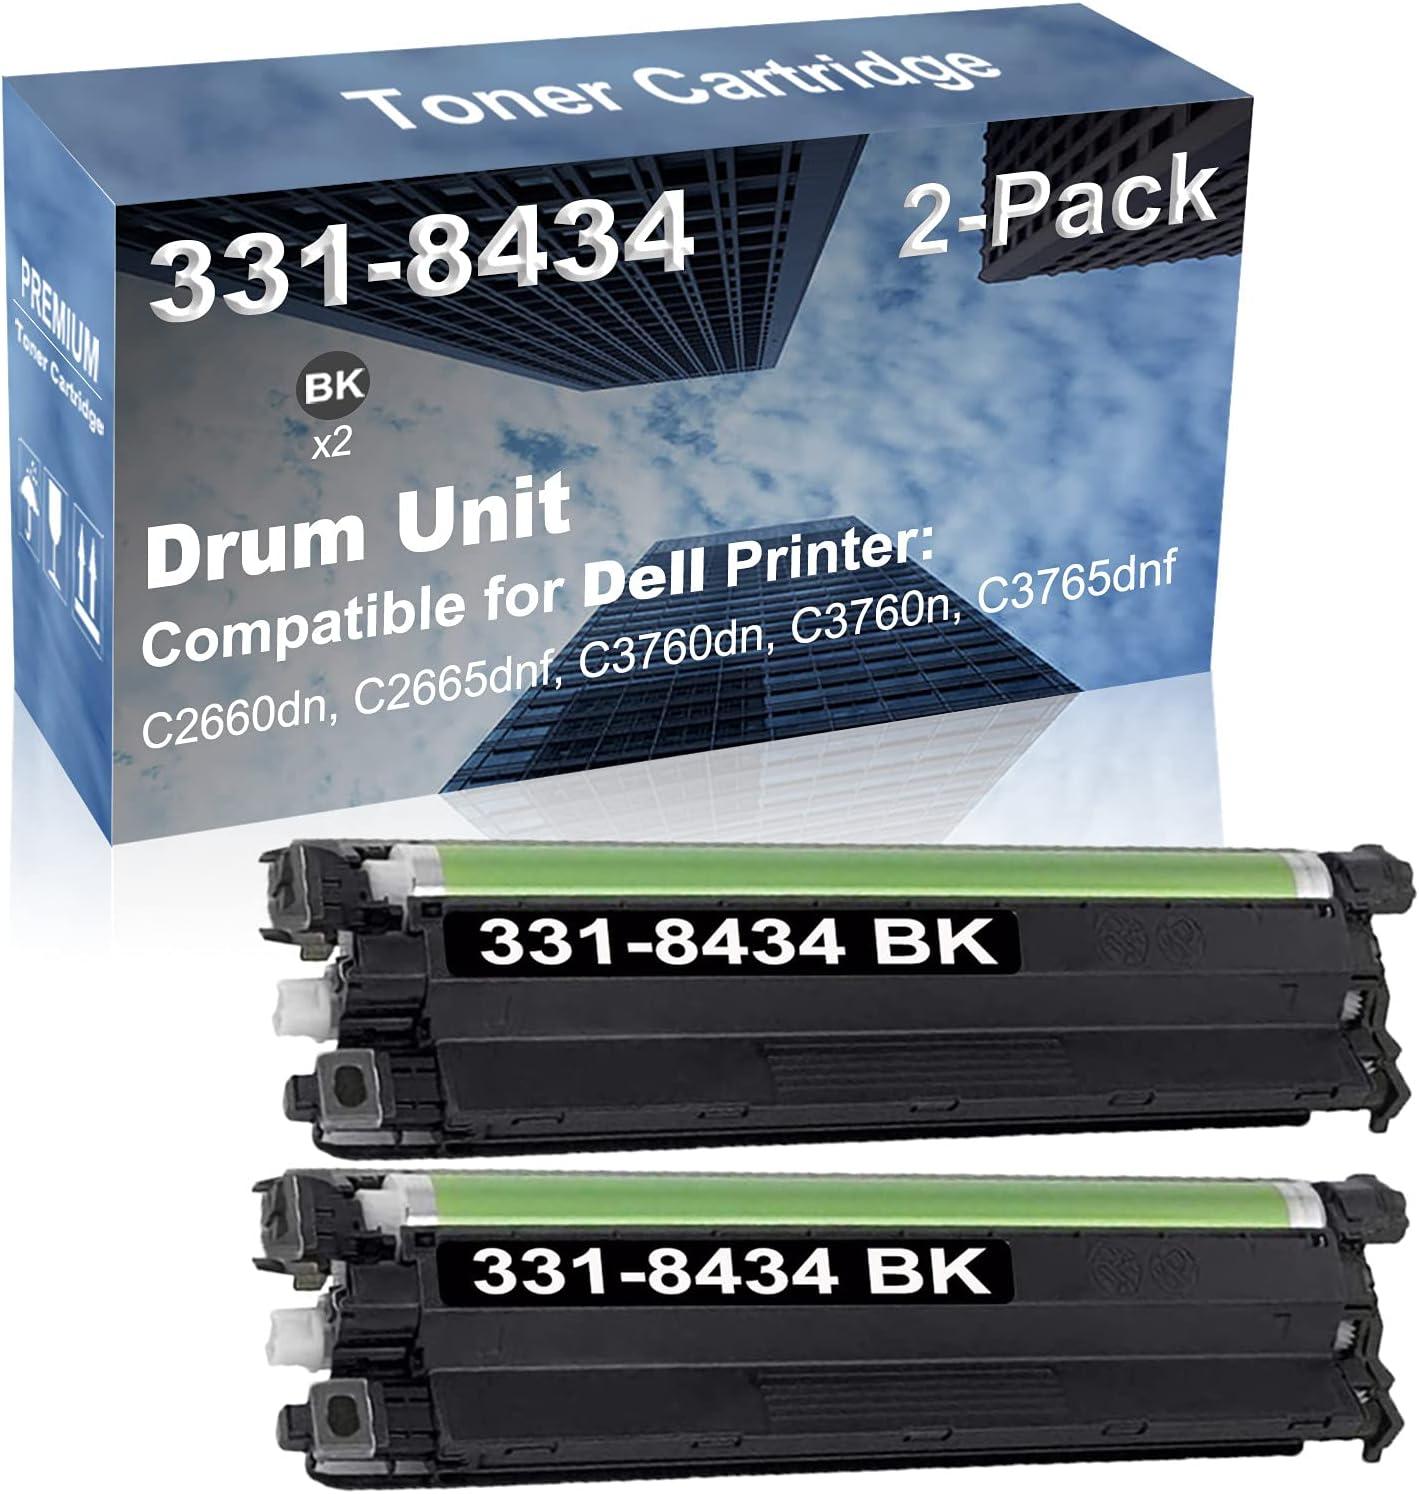 2-Pack Black Compatible C2660dn C3760n Seattle Mall C3 C2665dnf Cheap sale C3760dn